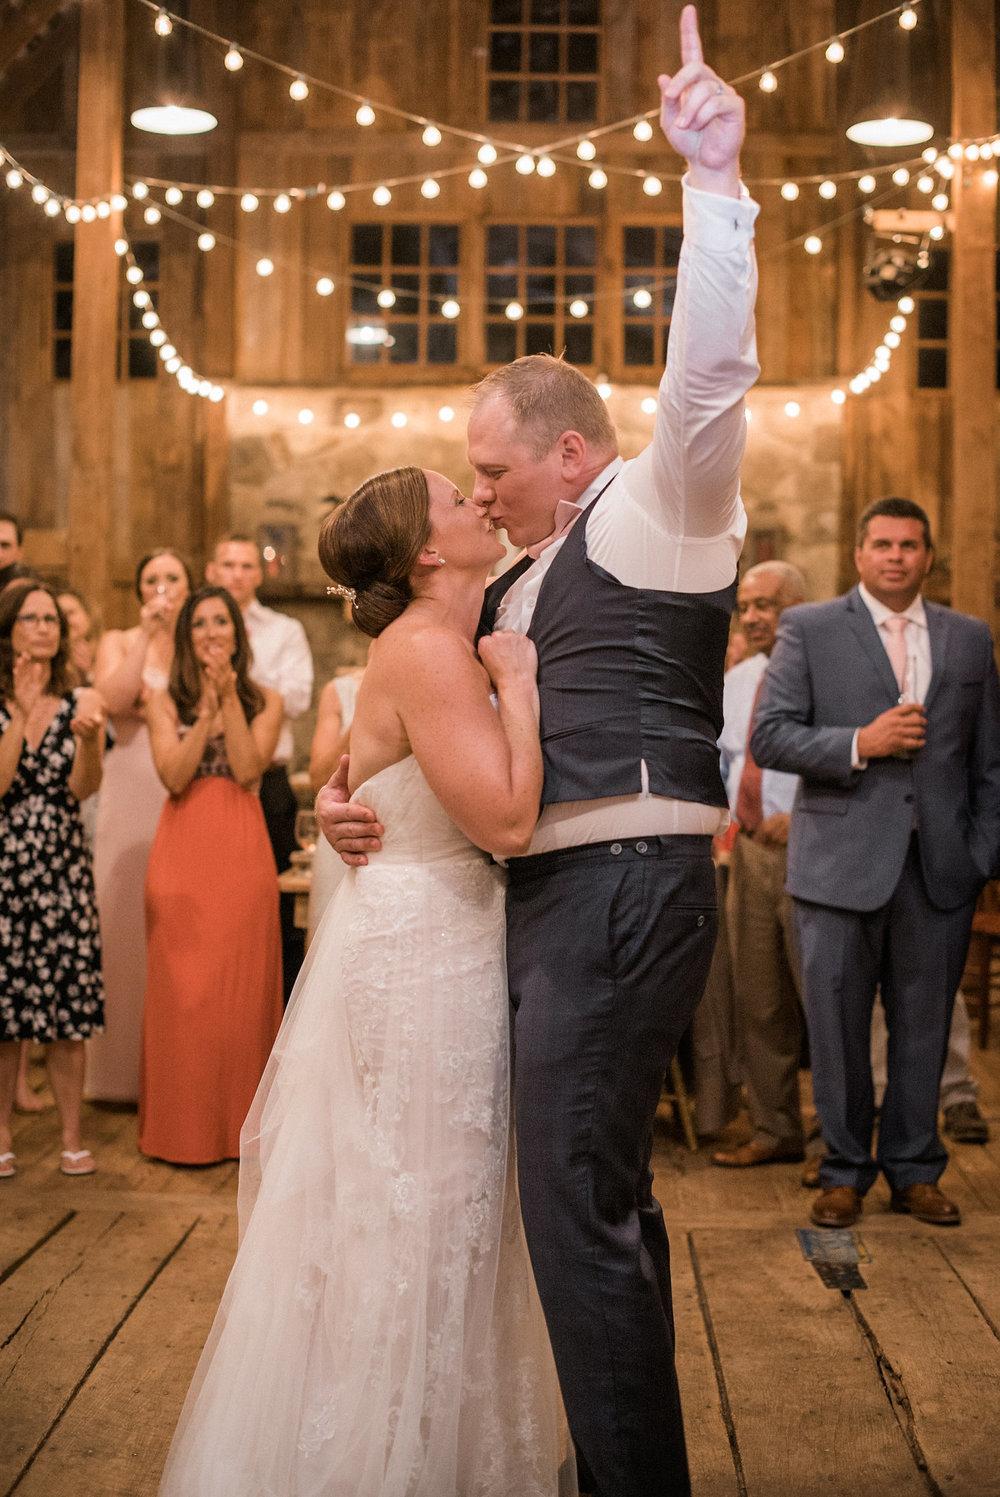 Bride+and+groom+on+the+dance+floor.jpg